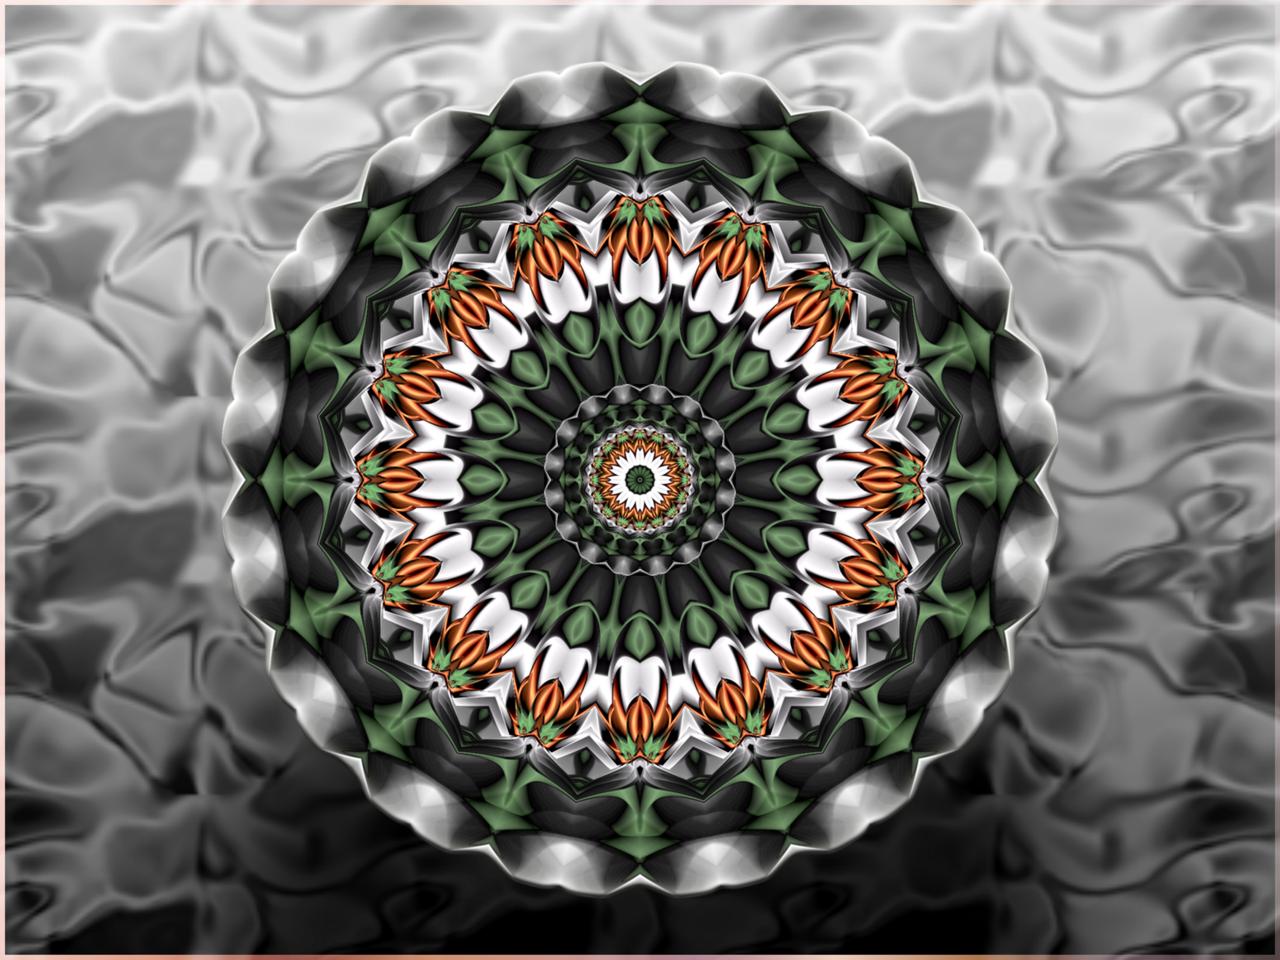 lethe_by_scrano-d7udls7